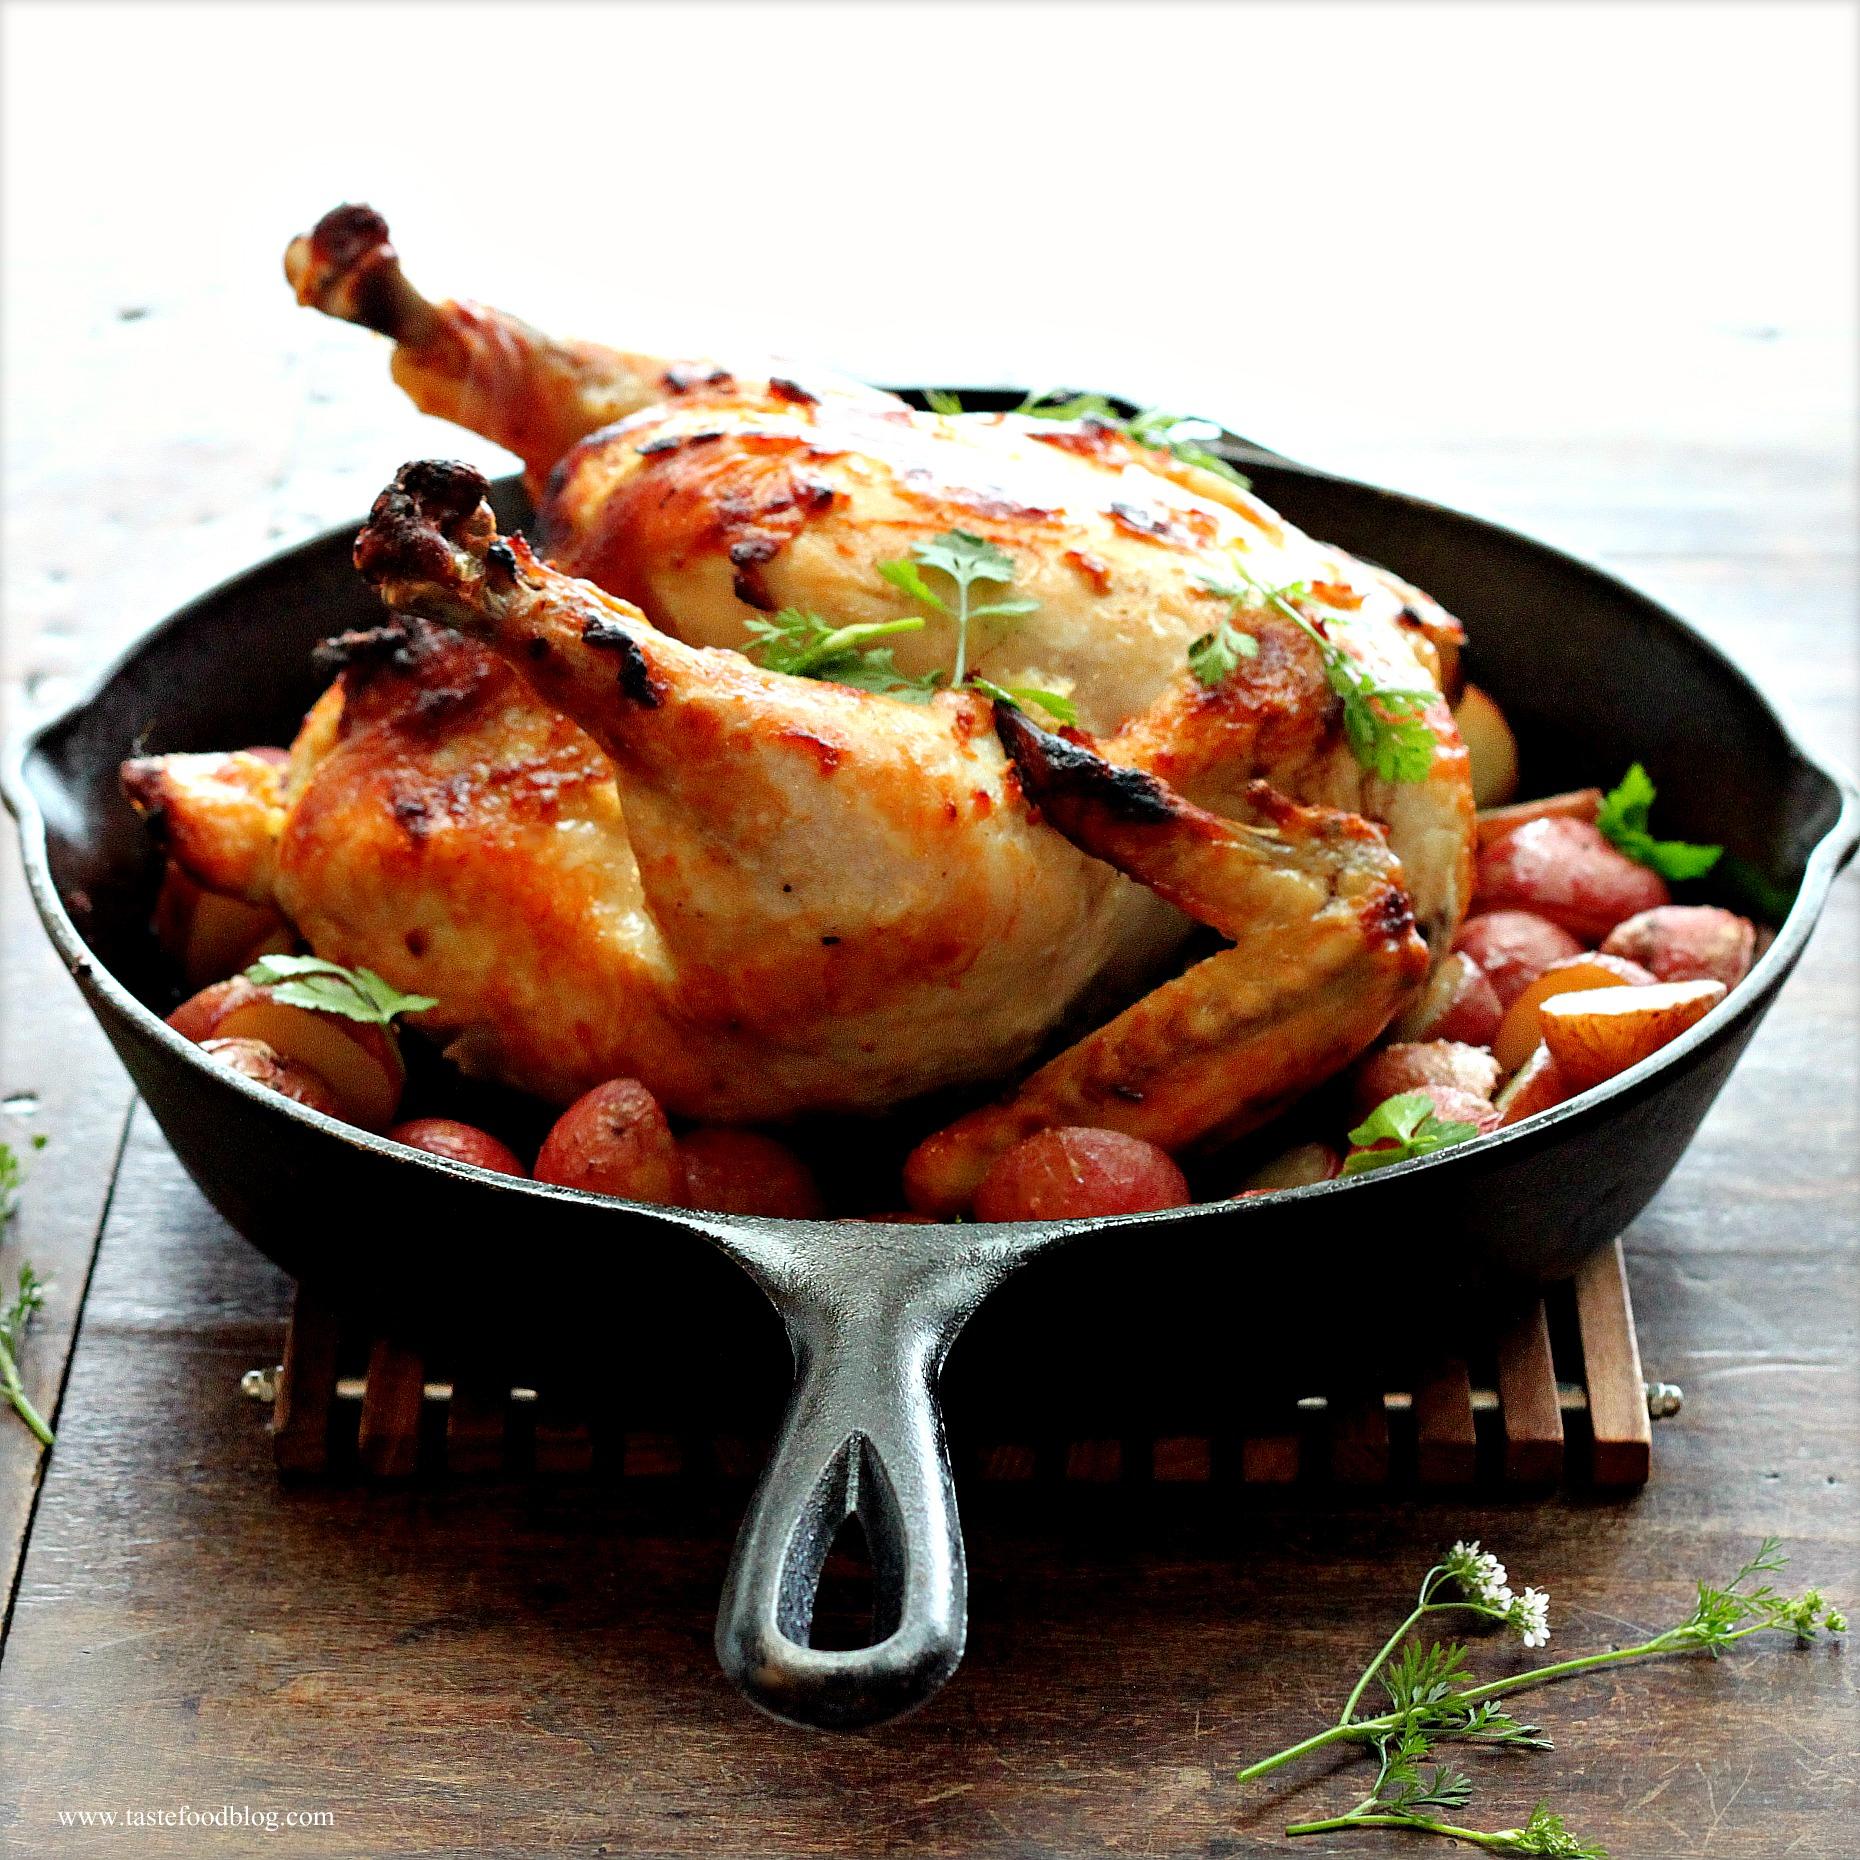 Roasted Chicken And Potatoes With Yogurt, Lemon And Garlic